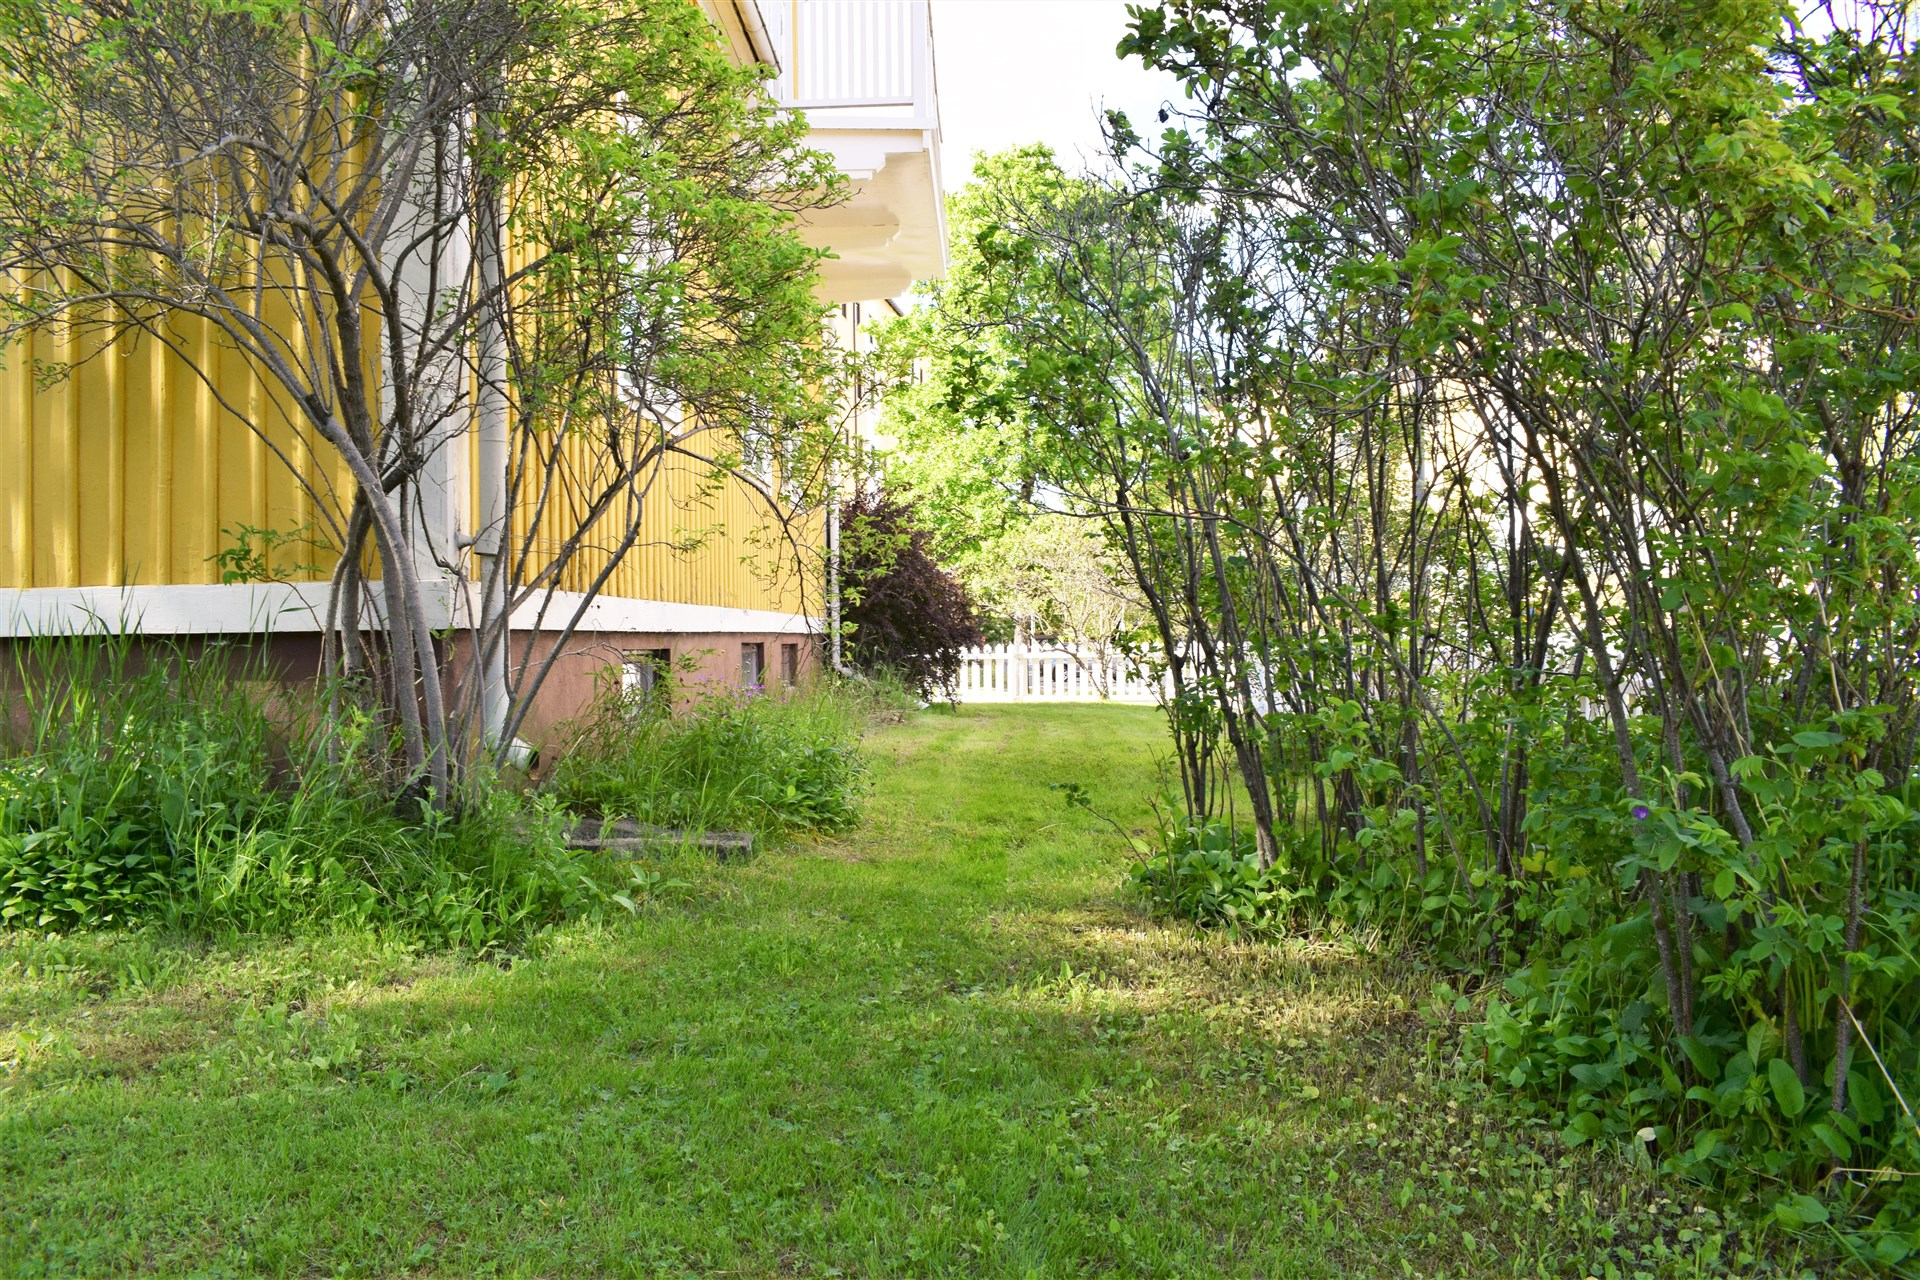 Lummig trädgårdstomt